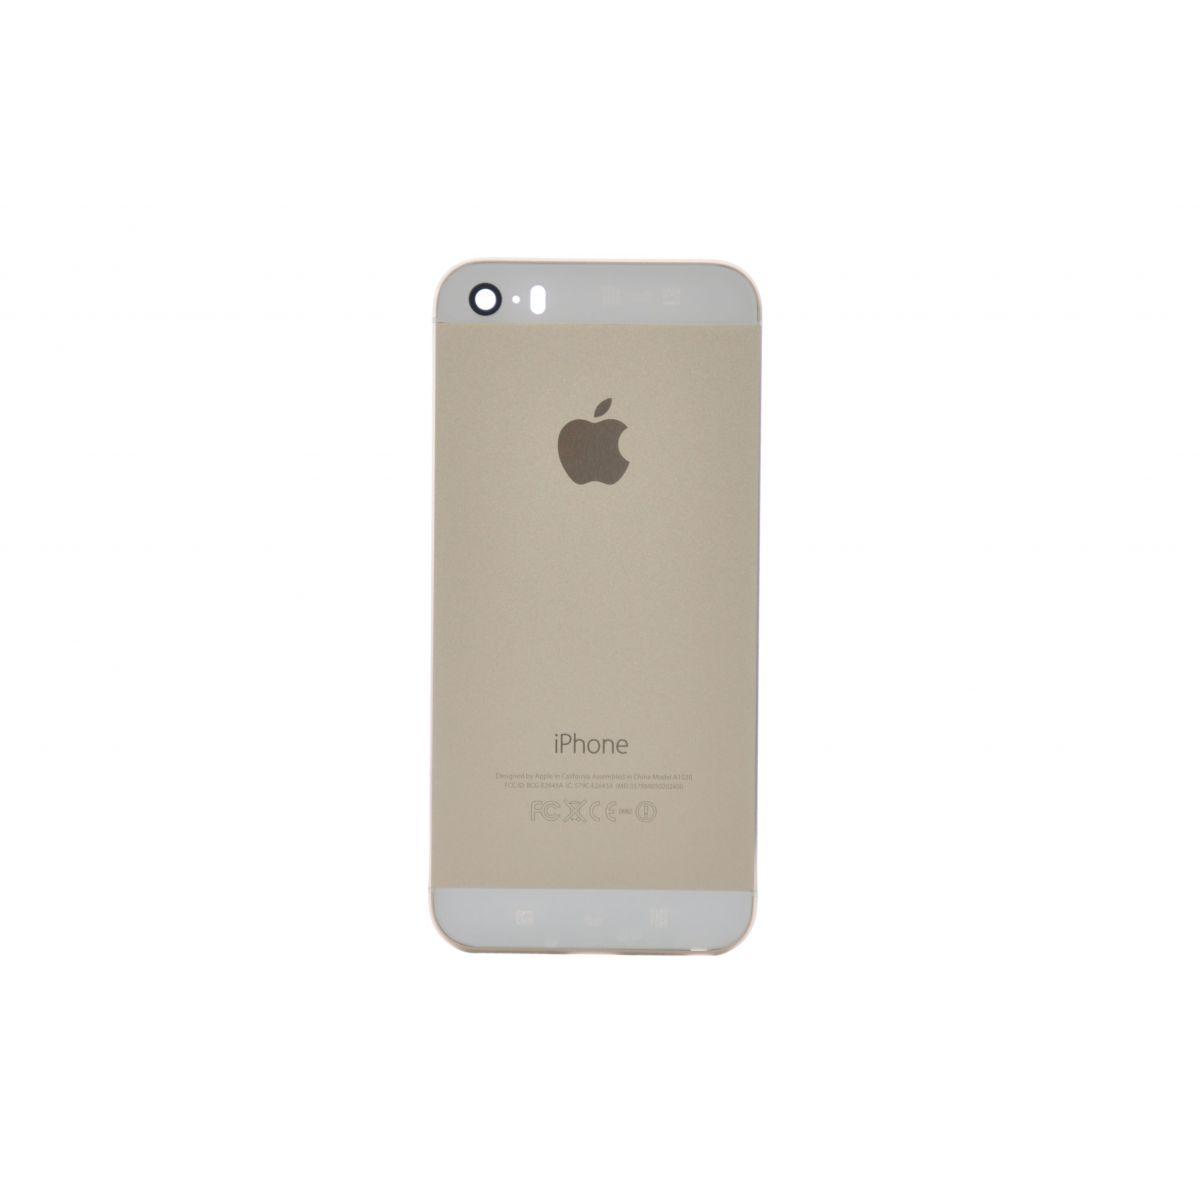 Carcaca Apple Iphone 5s Dourado Acompanha Componentes. Nao Incluso Cabos Flex